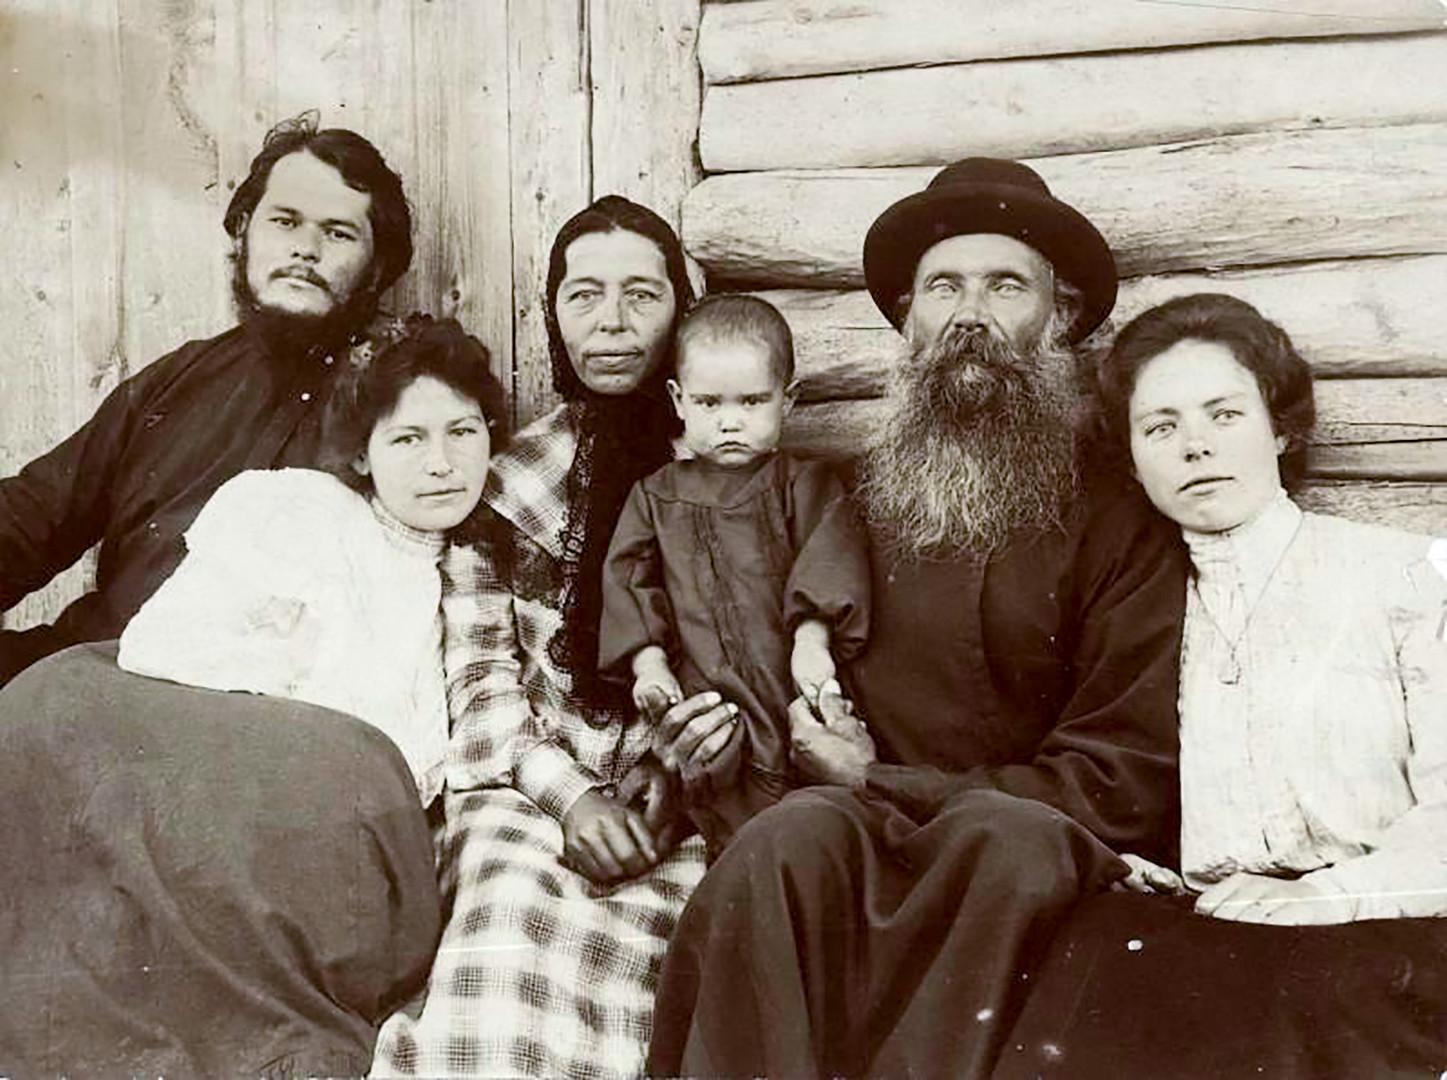 Retrato de família burguesa